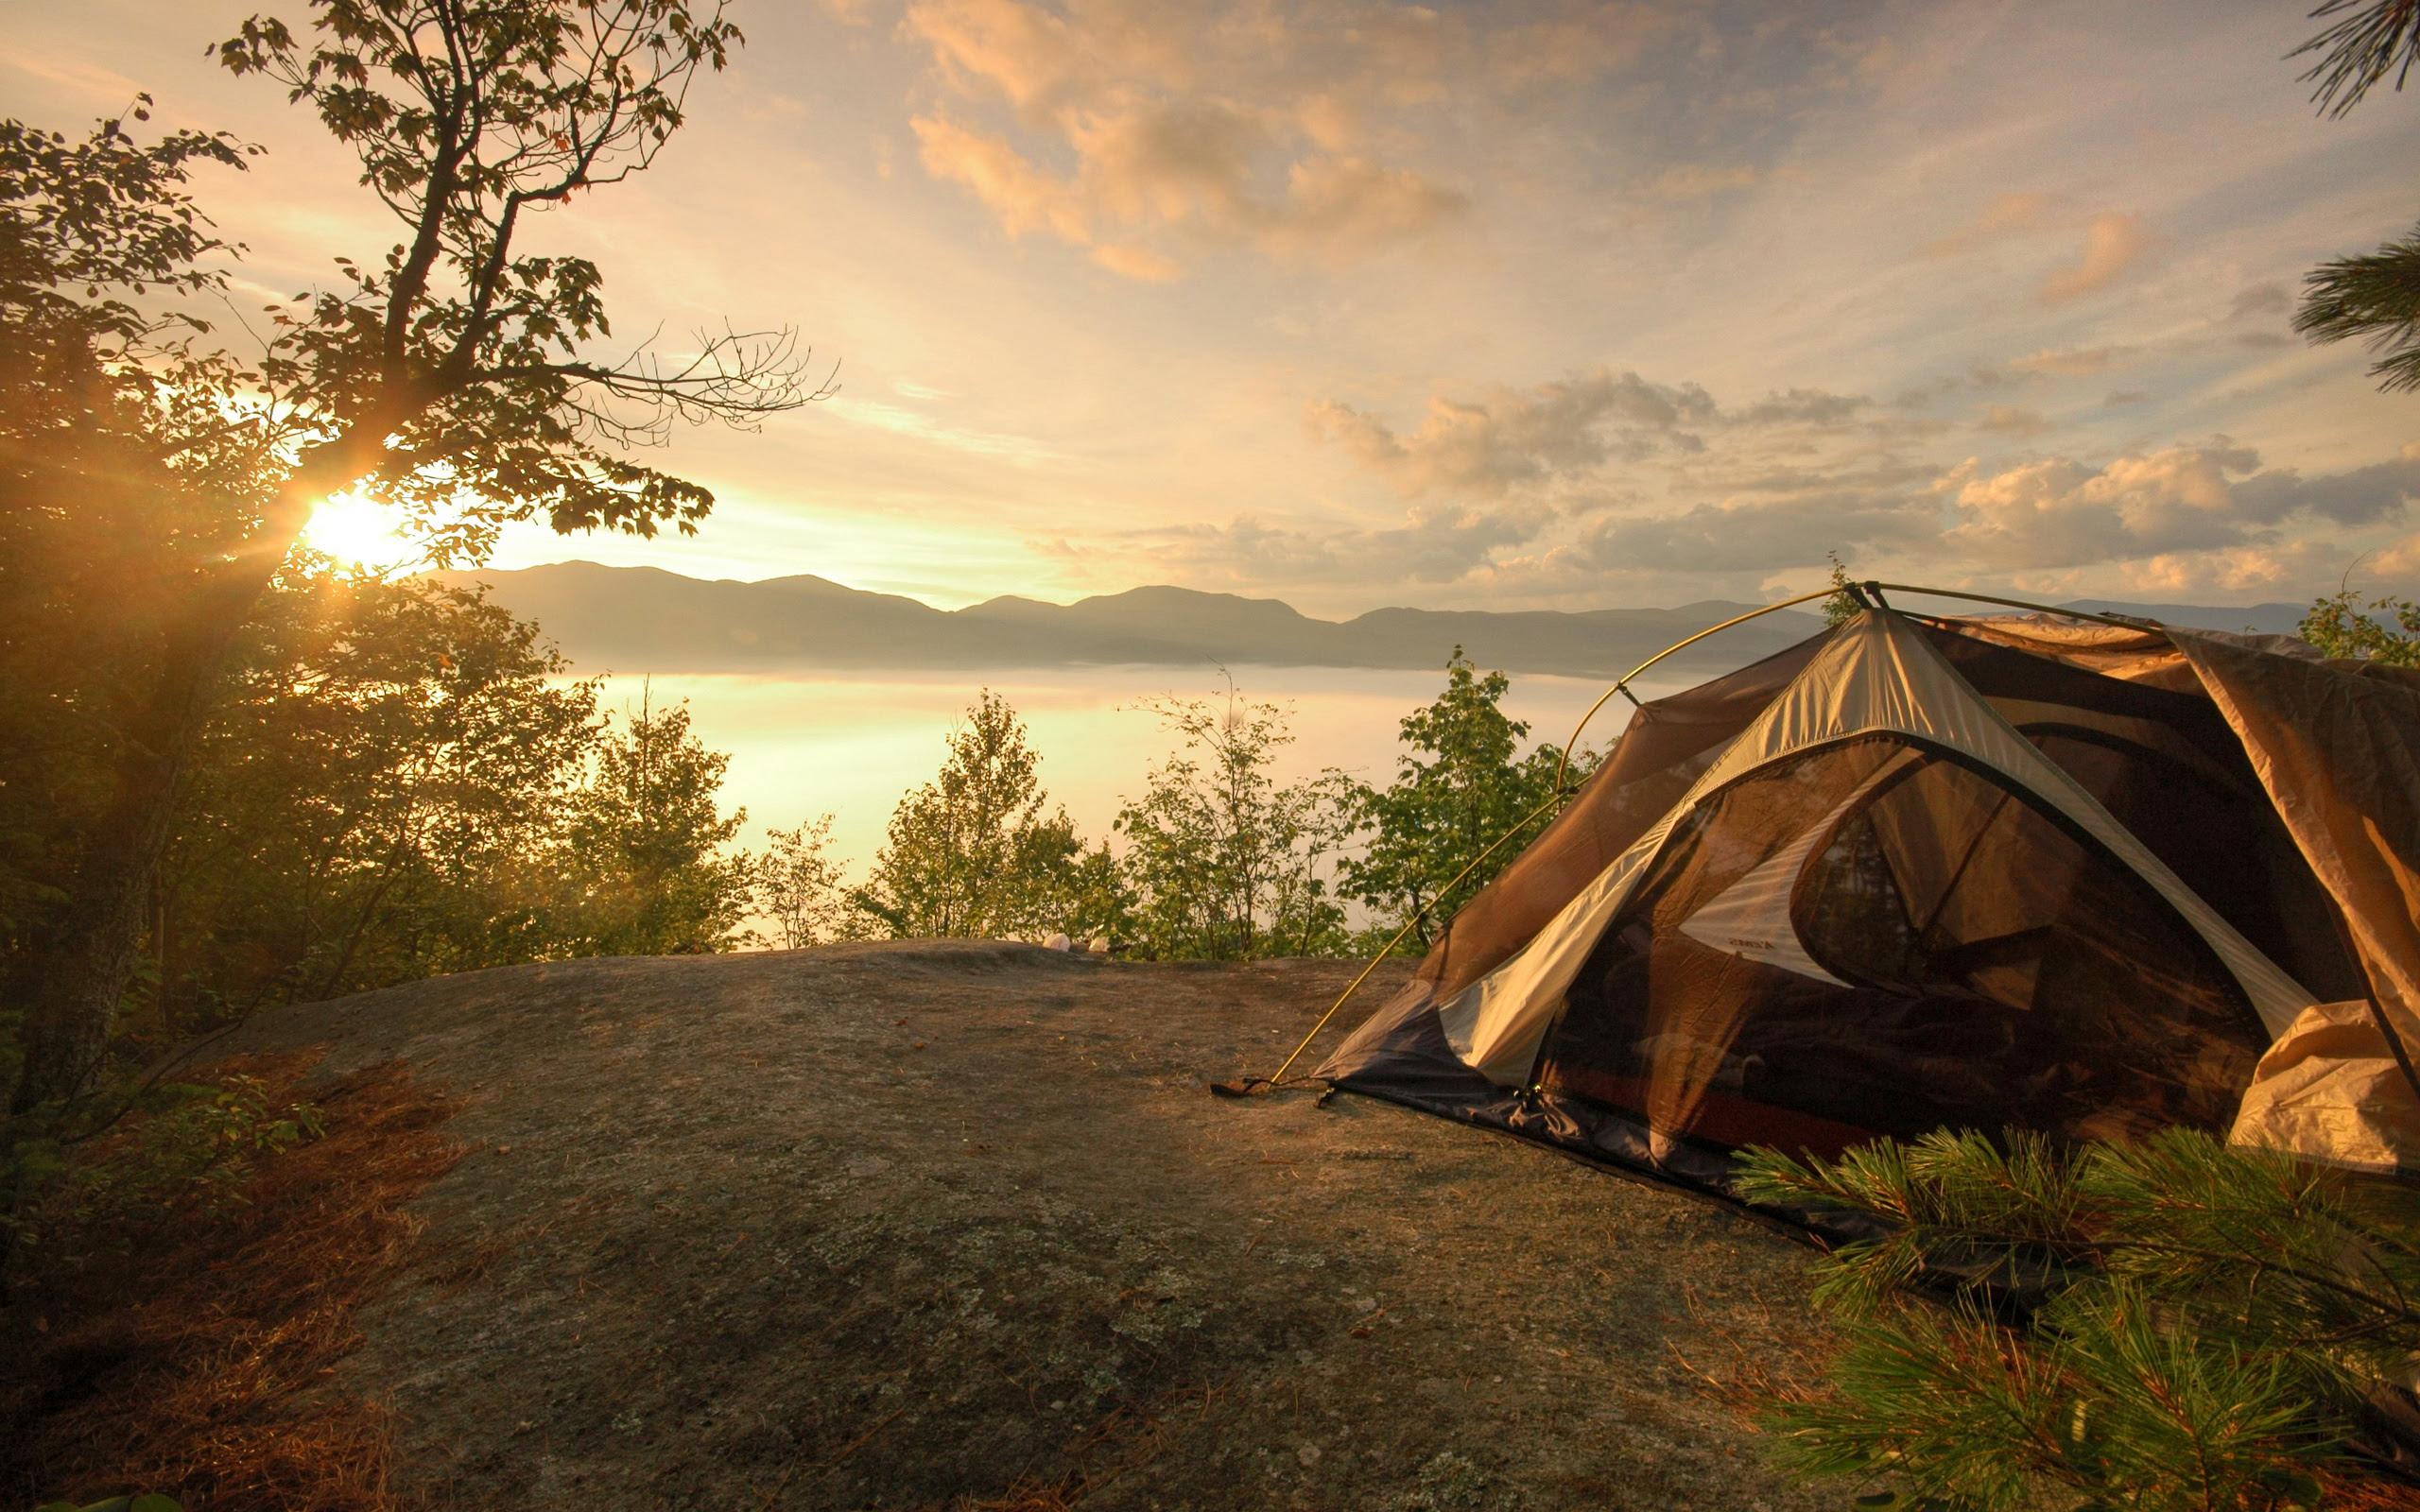 Bestplacetovisitinindonesia; How To Slumber Spell Camping